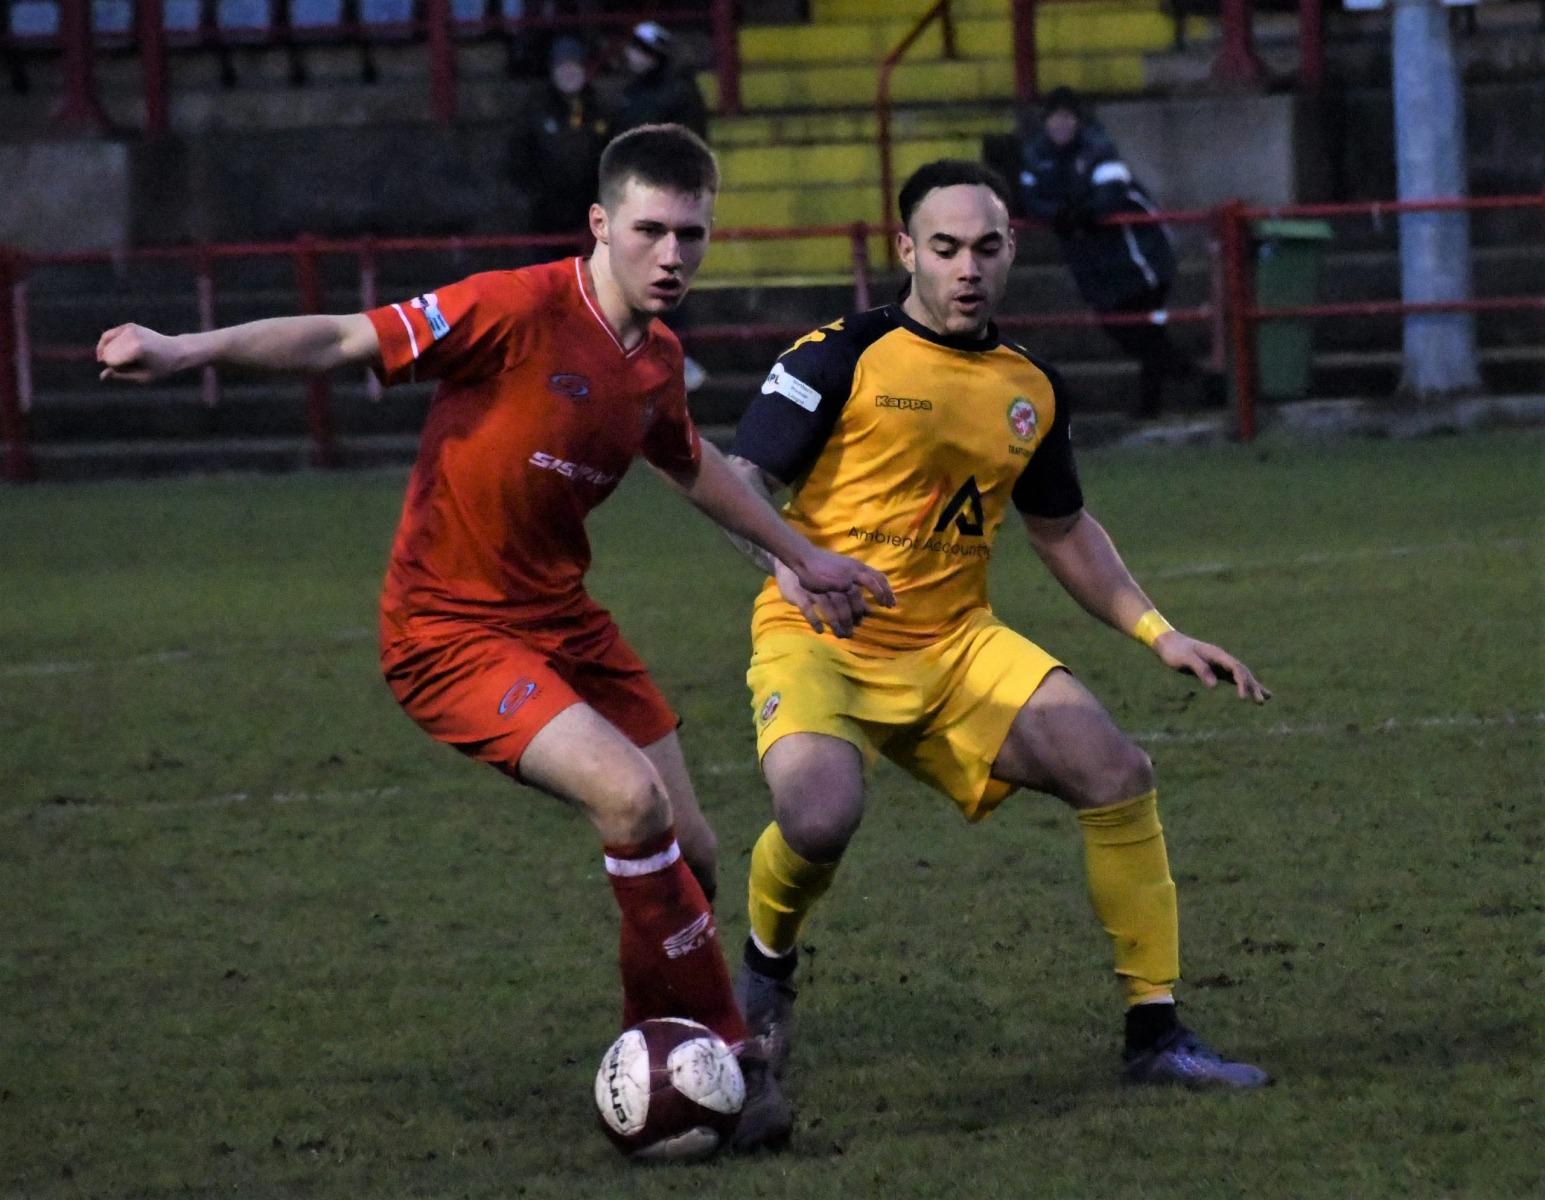 Workington-Reds-v-Trafford-Ben-Challis-24-scaled